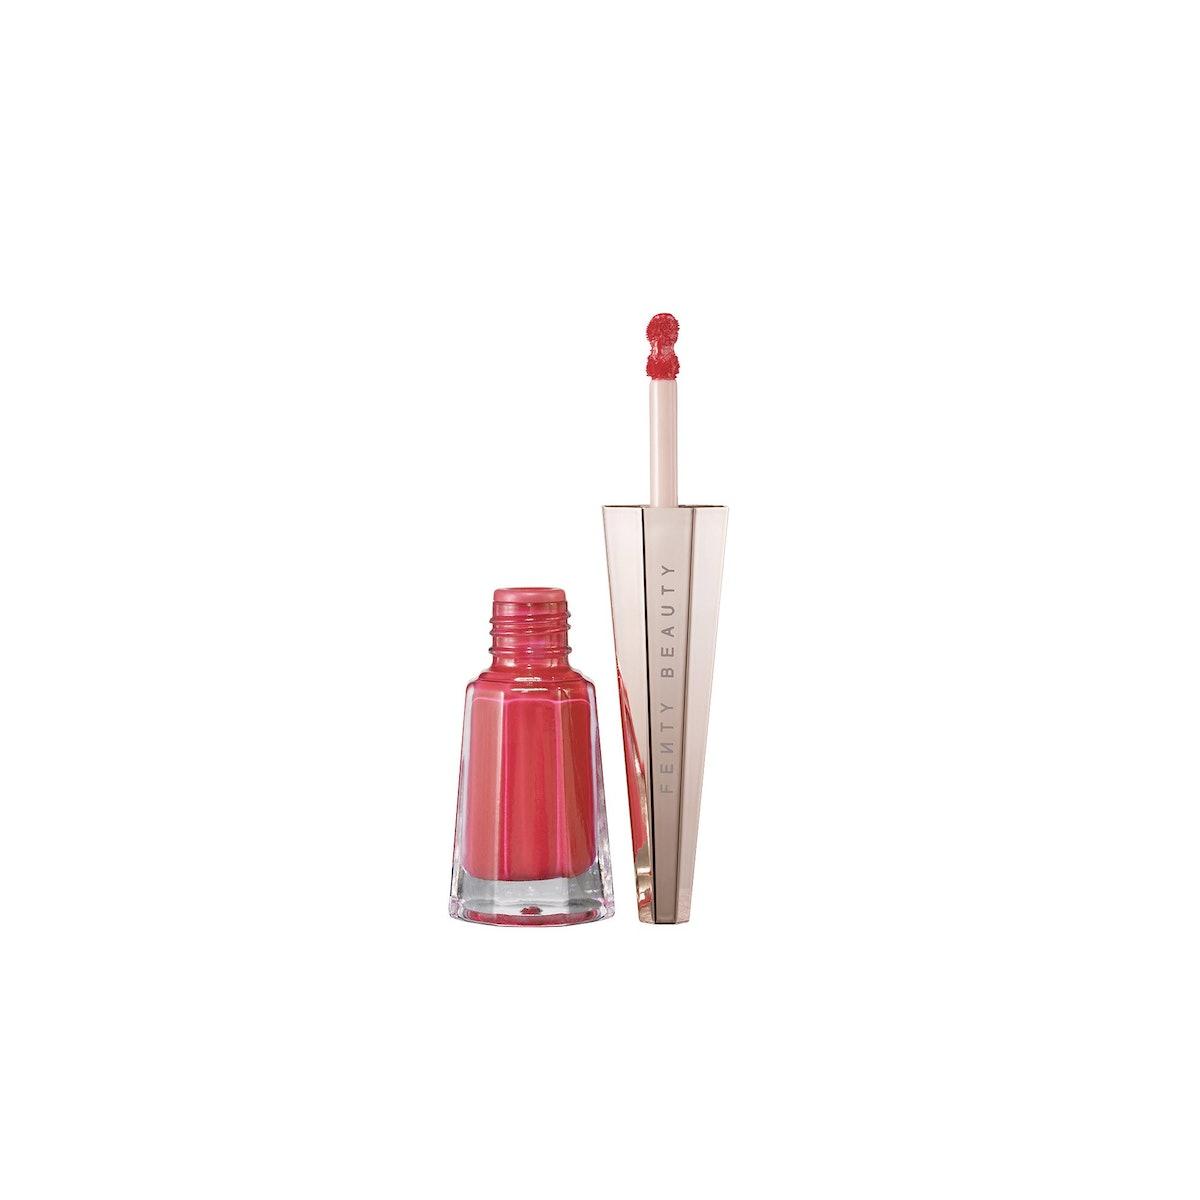 Fenty Beauty Stunna Lip Paint in Unattached (Open).jpg